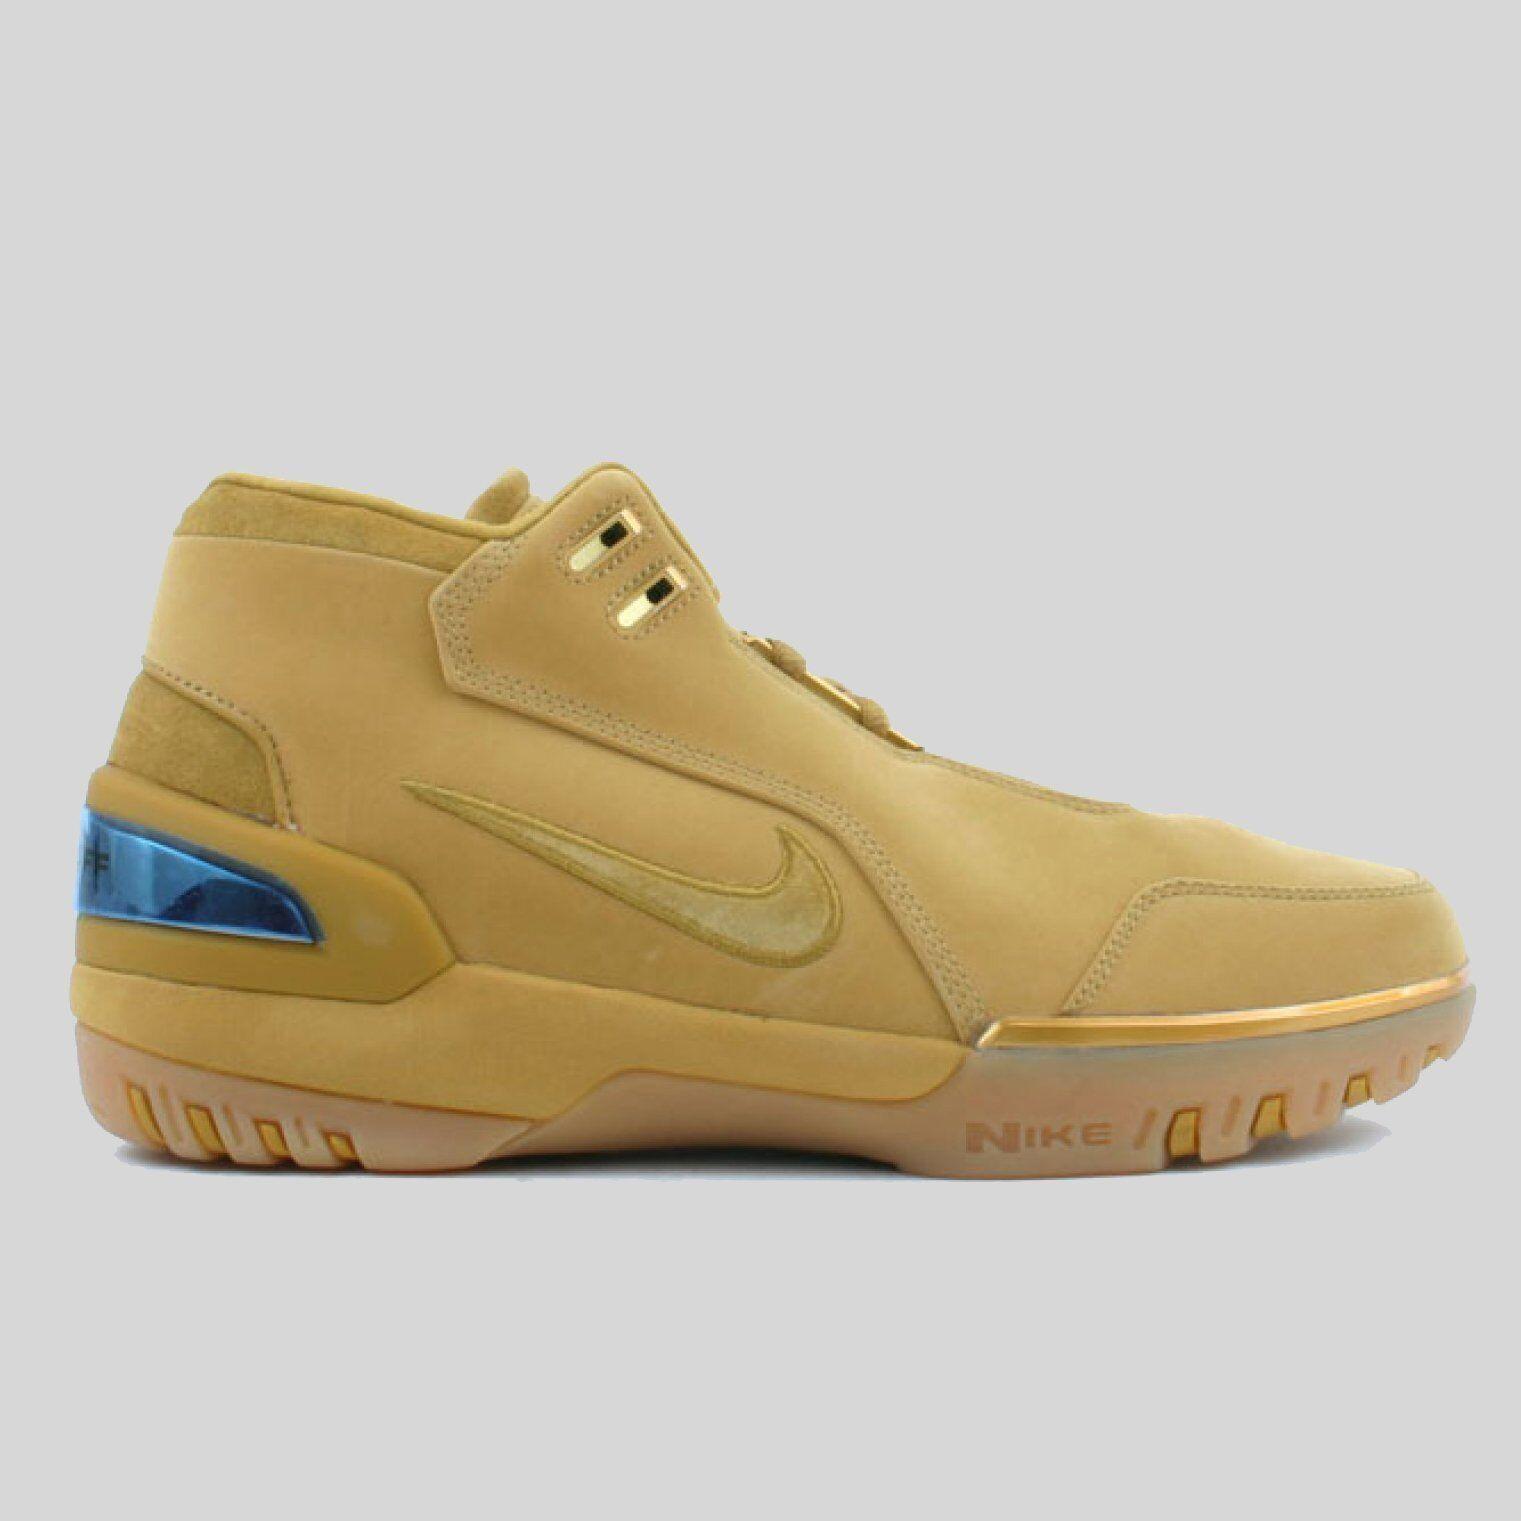 Nike air zoom generazione lebron 1 asg qs grano dimensioni aq0110-700